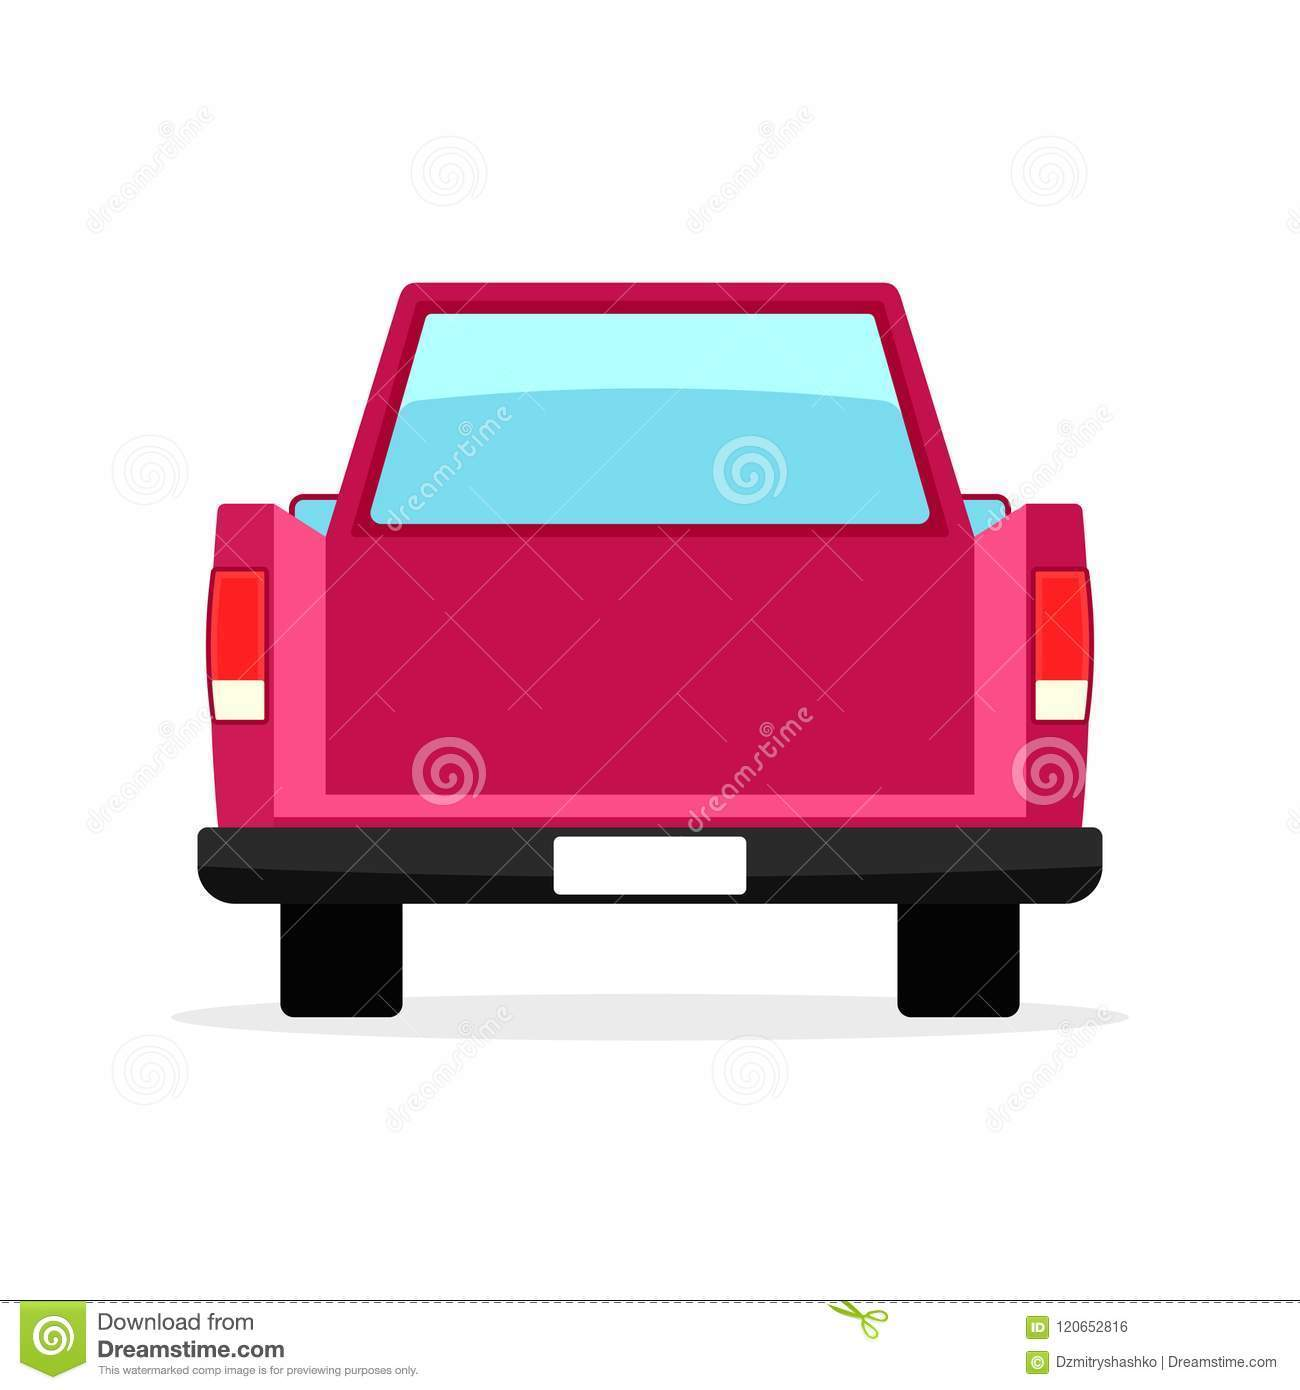 Car clipart back view 4 » Clipart Portal.